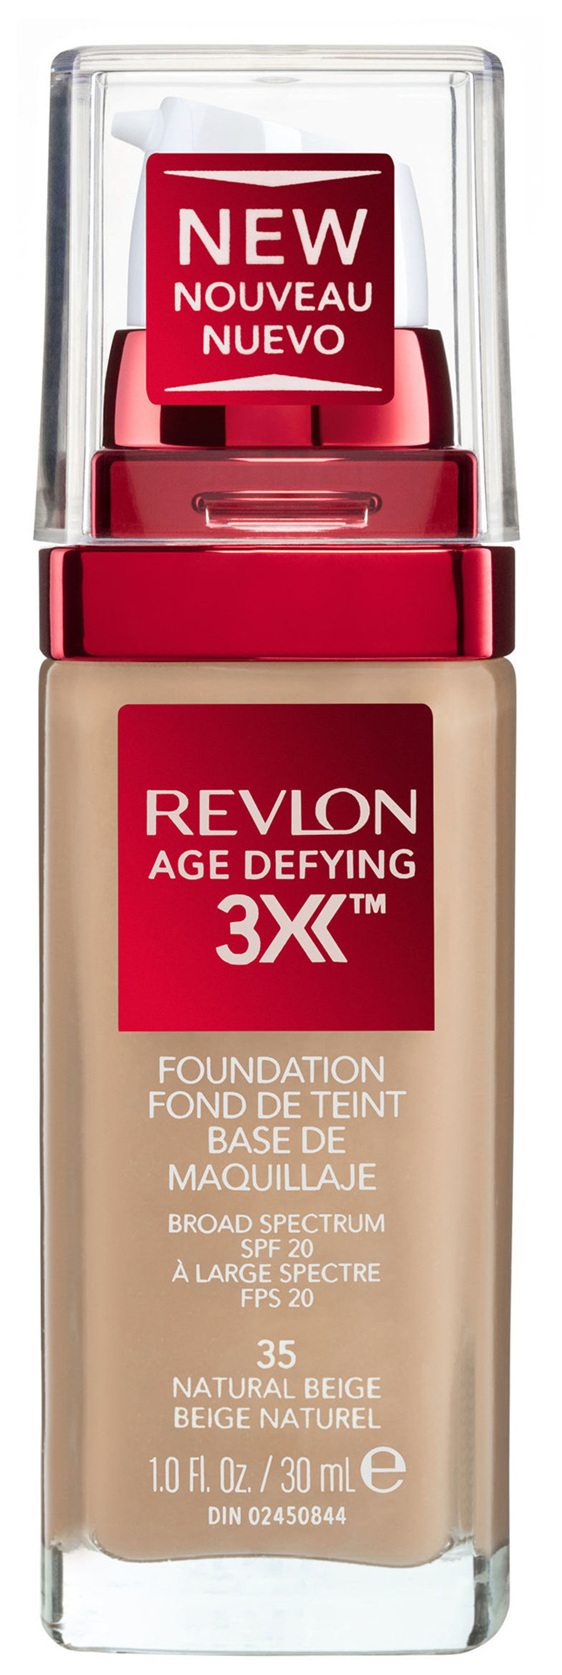 Revlon Age Defying™ 3X Foundation Natural Beige